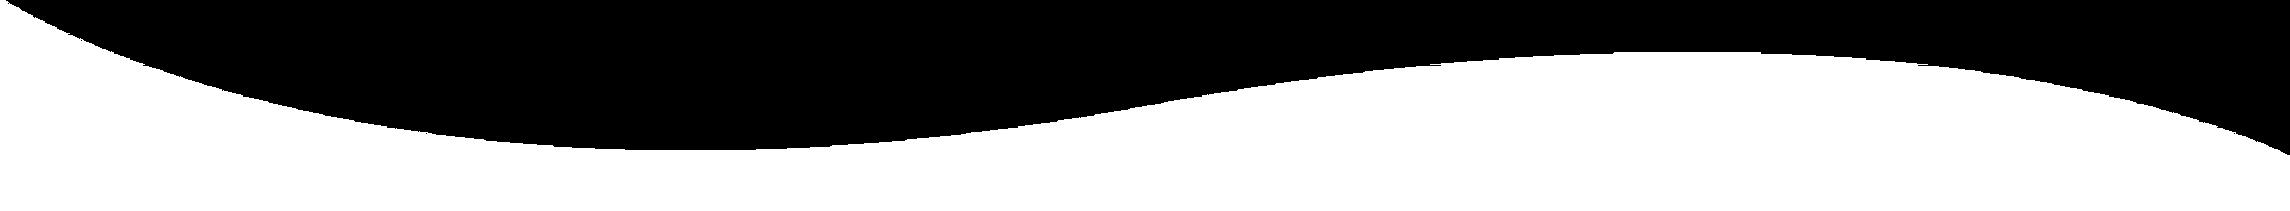 shape_2 (1).png